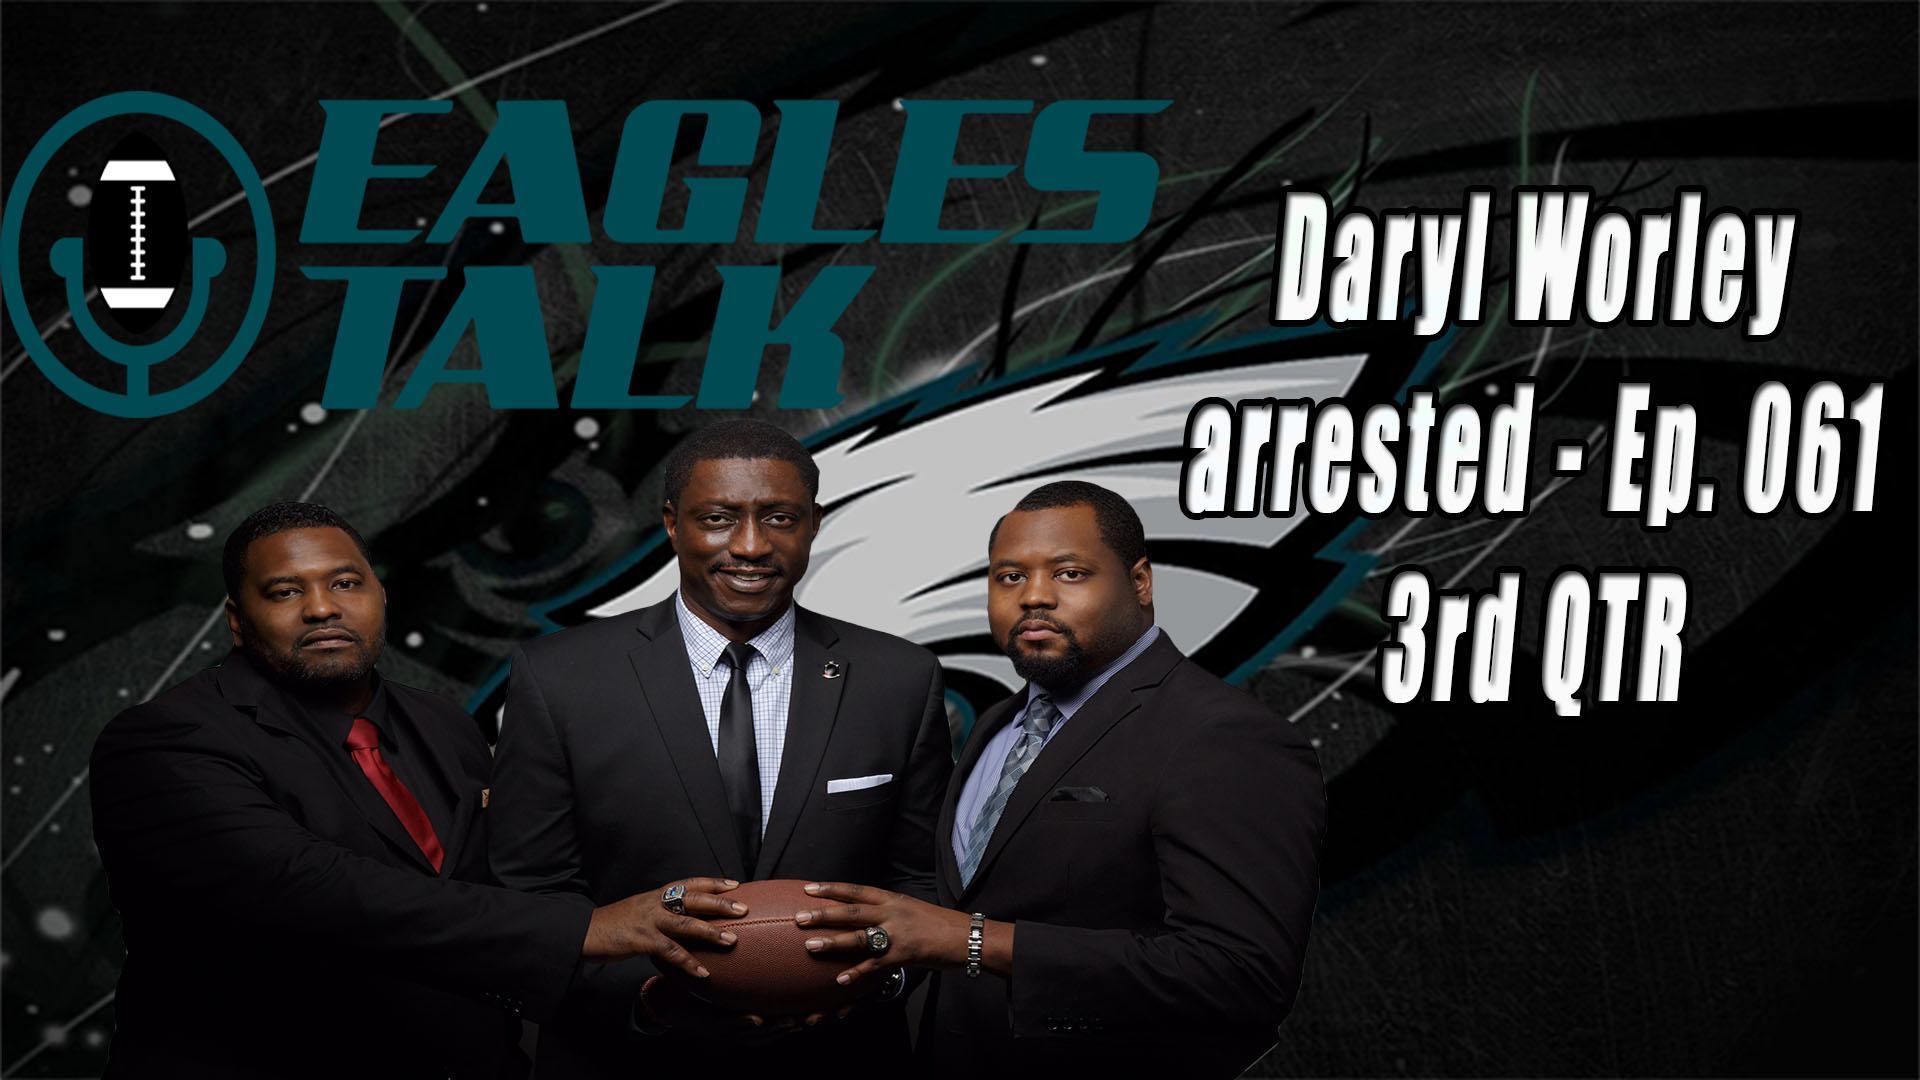 Eagles Talk Ep061 – Daryl Worley arrested (3RD QTR)